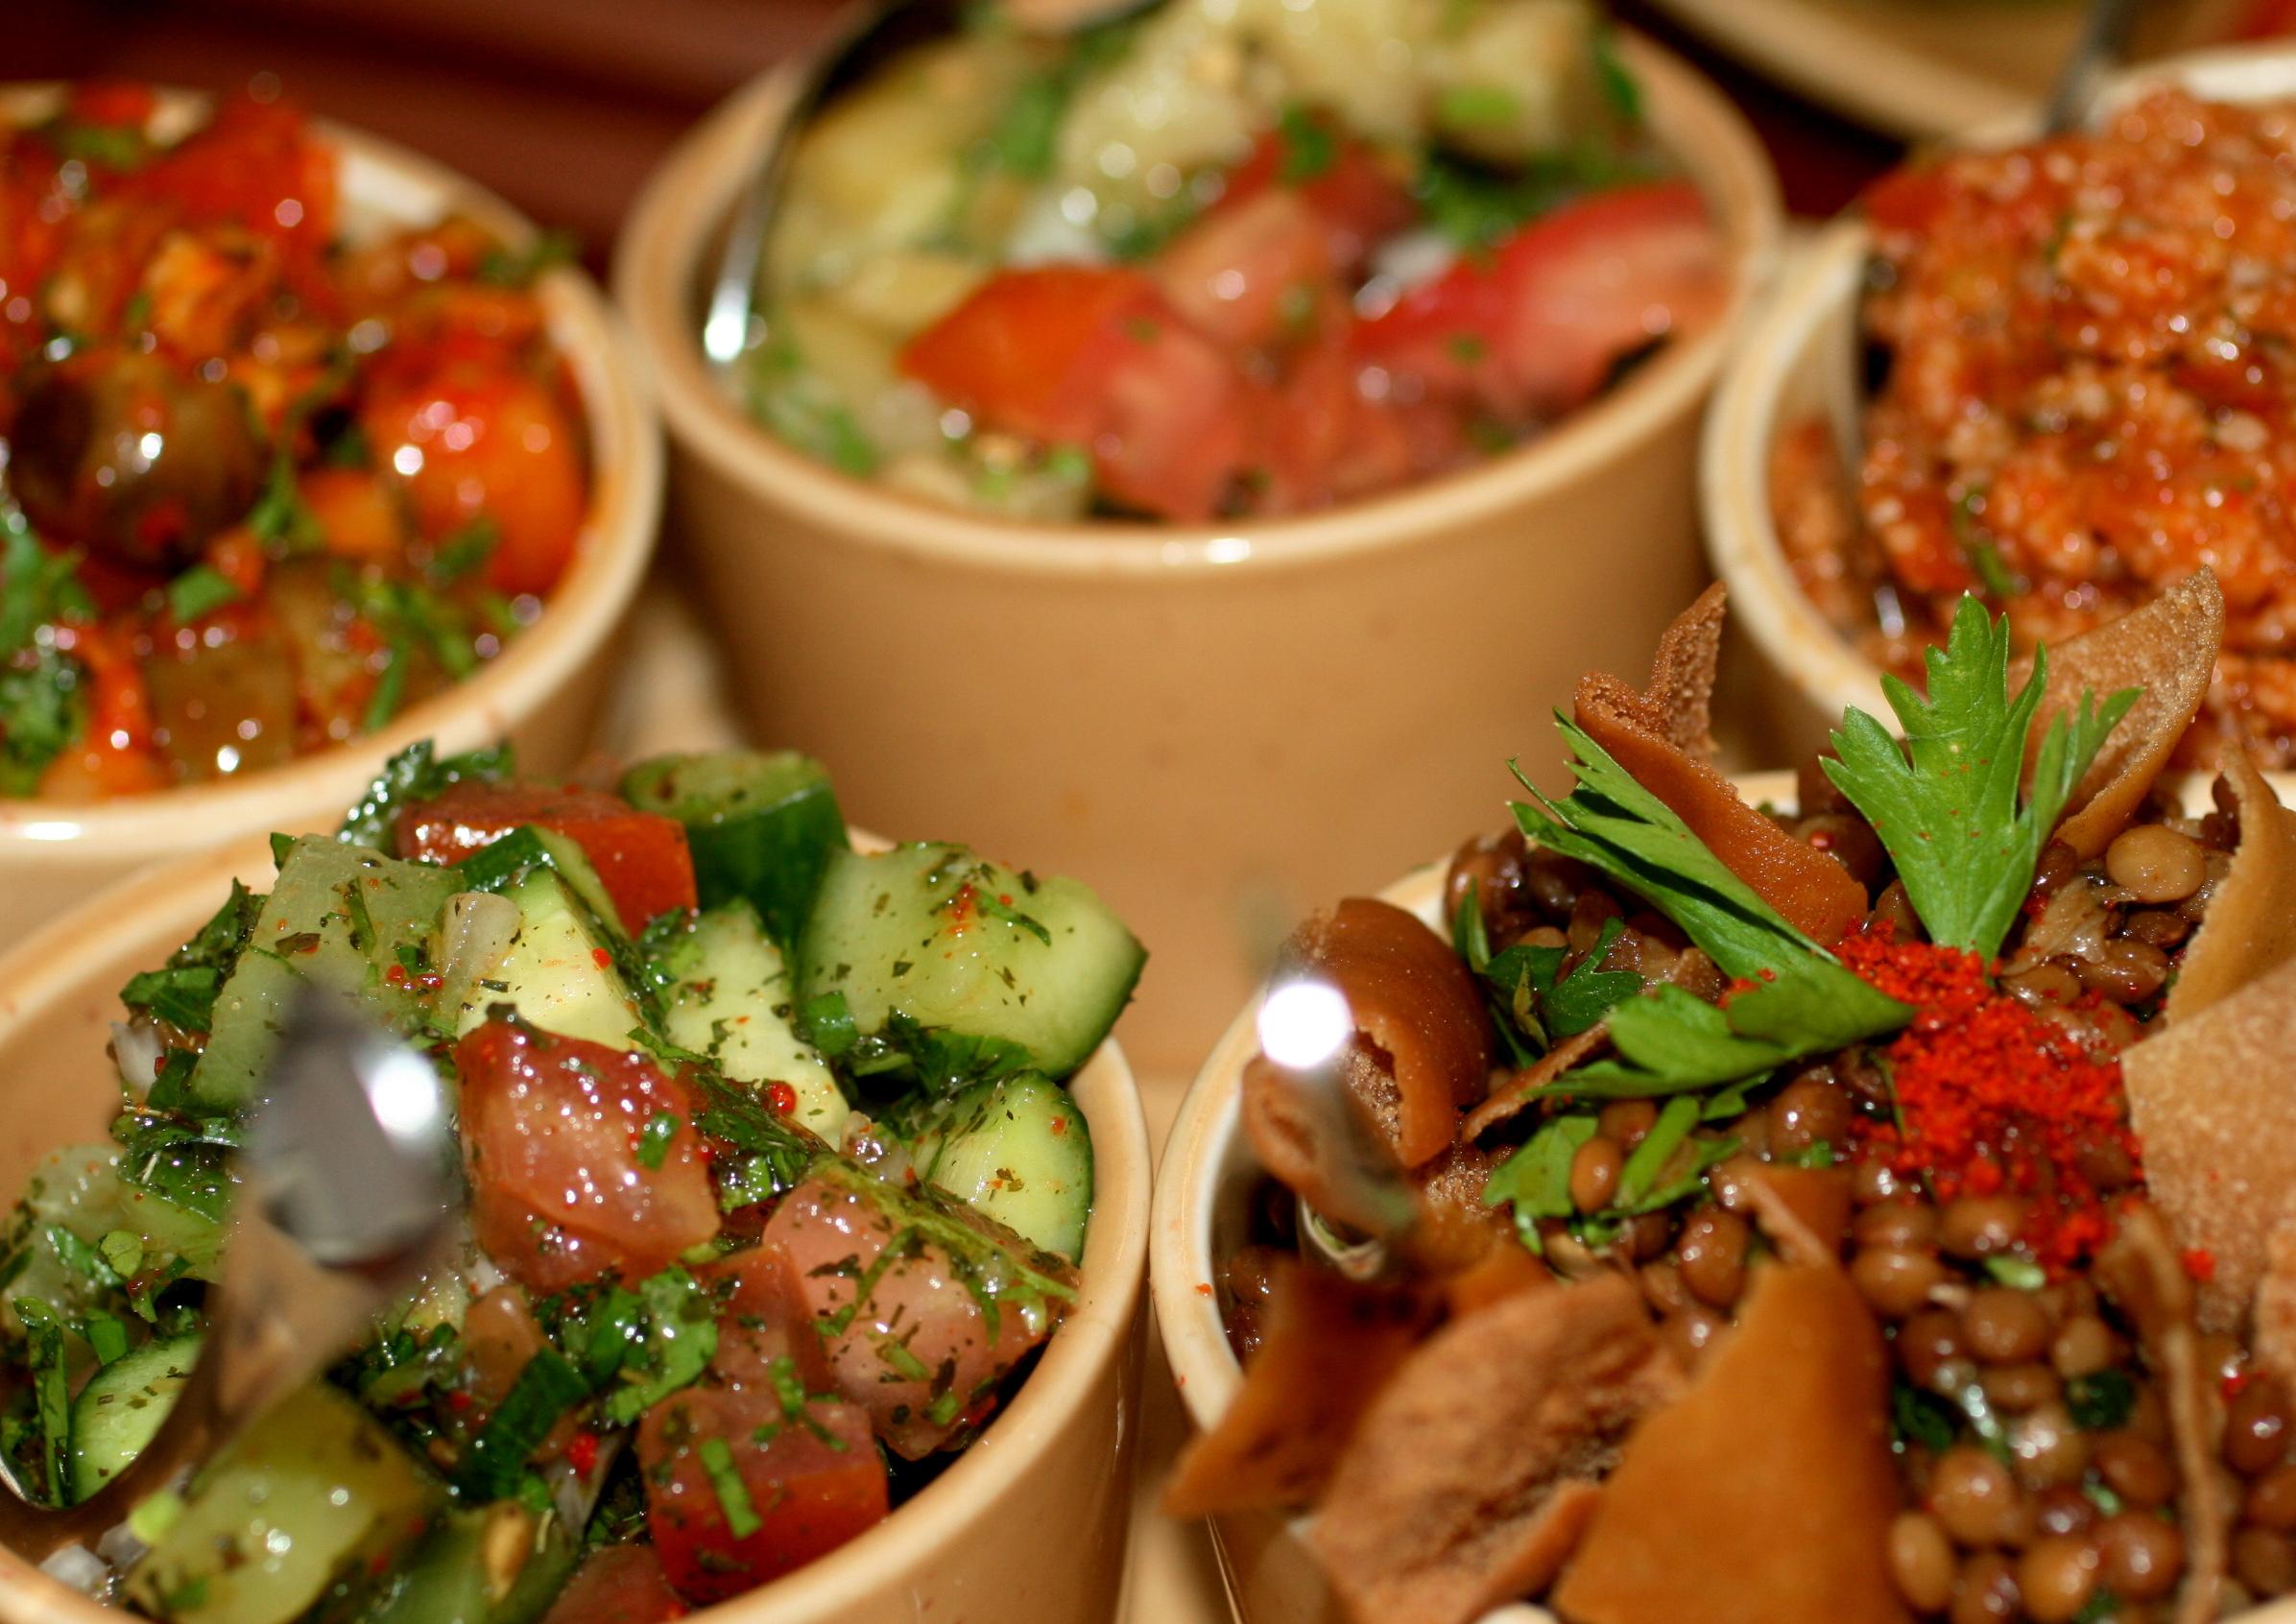 Seven day tour to armenia for gourmets aventura for Armenian cuisine history